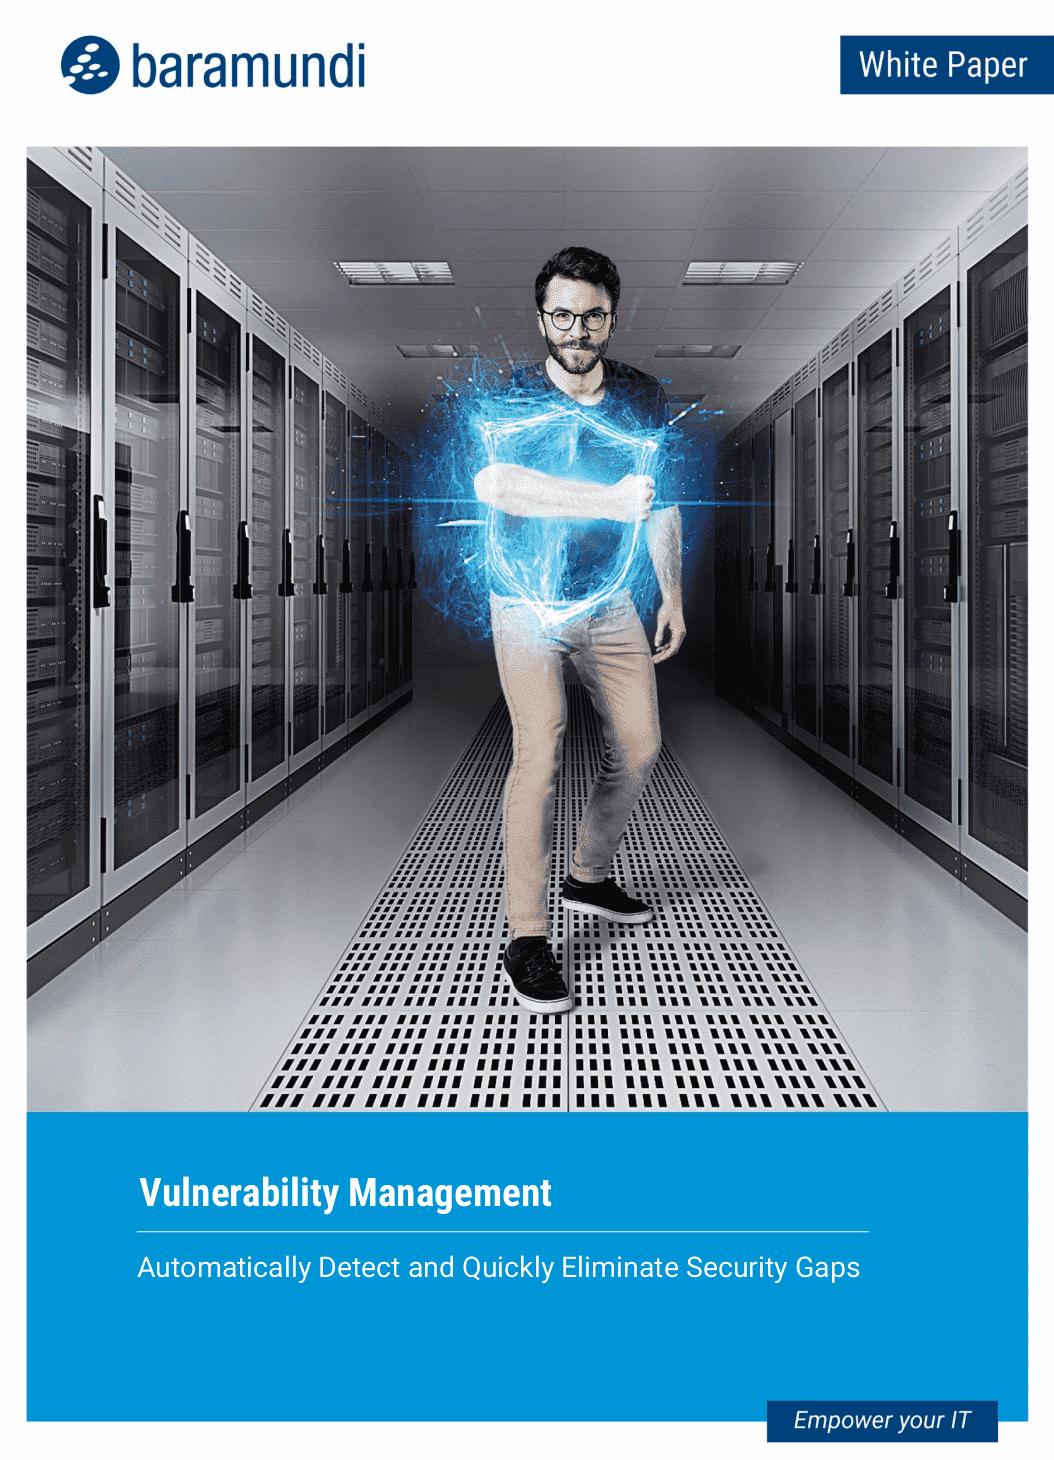 Whitepaper Vulnerability Management Baramundi